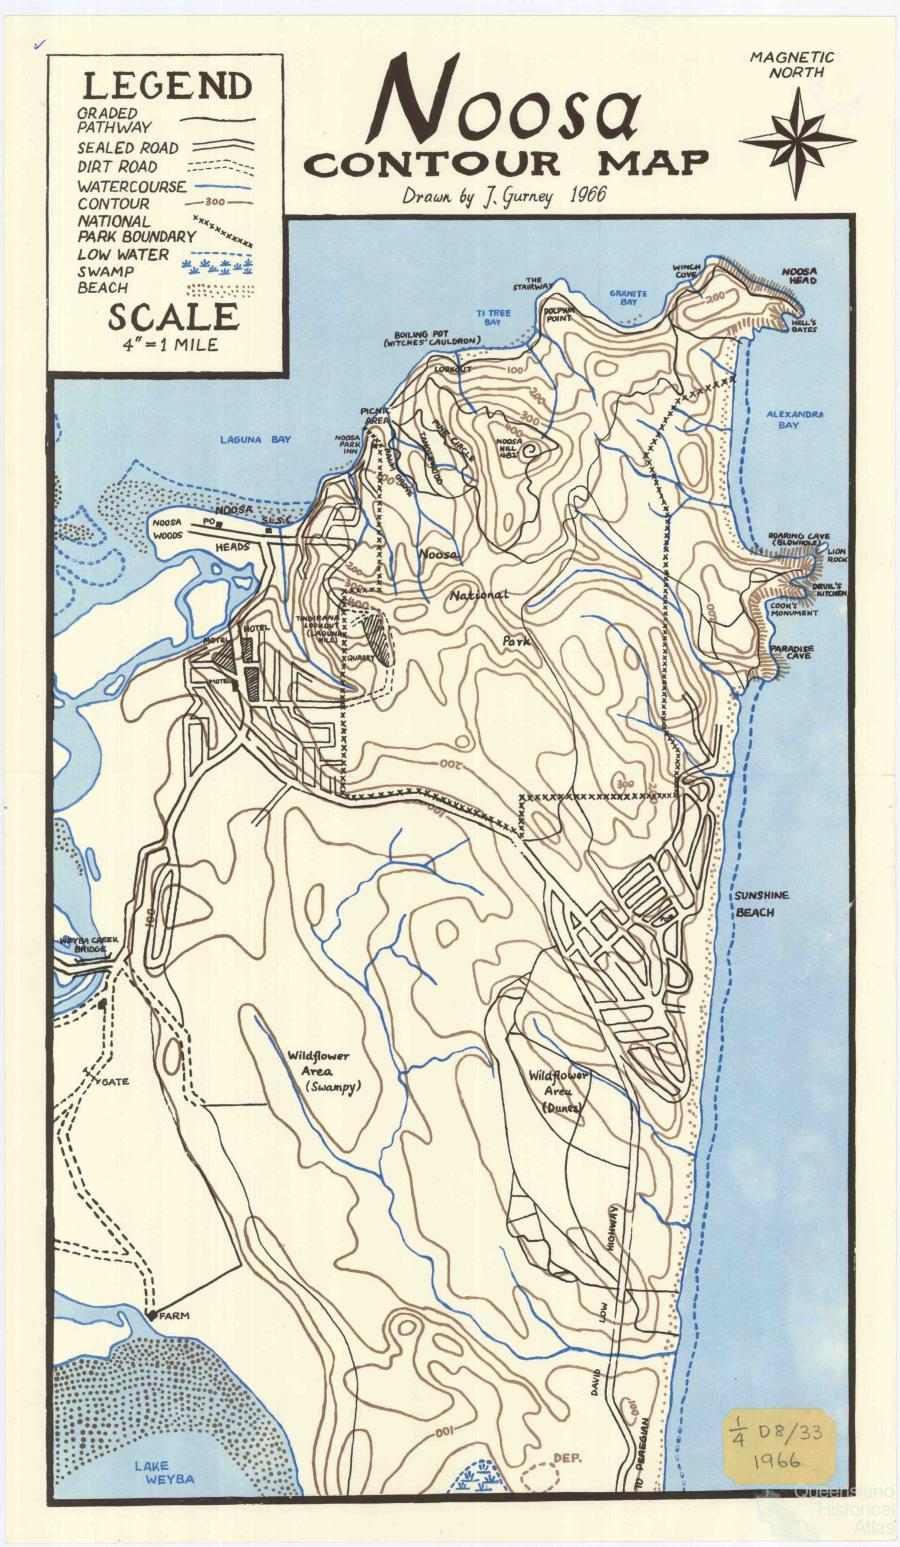 Noosa Contour Map, 1966 | Queensland Historical Atlas